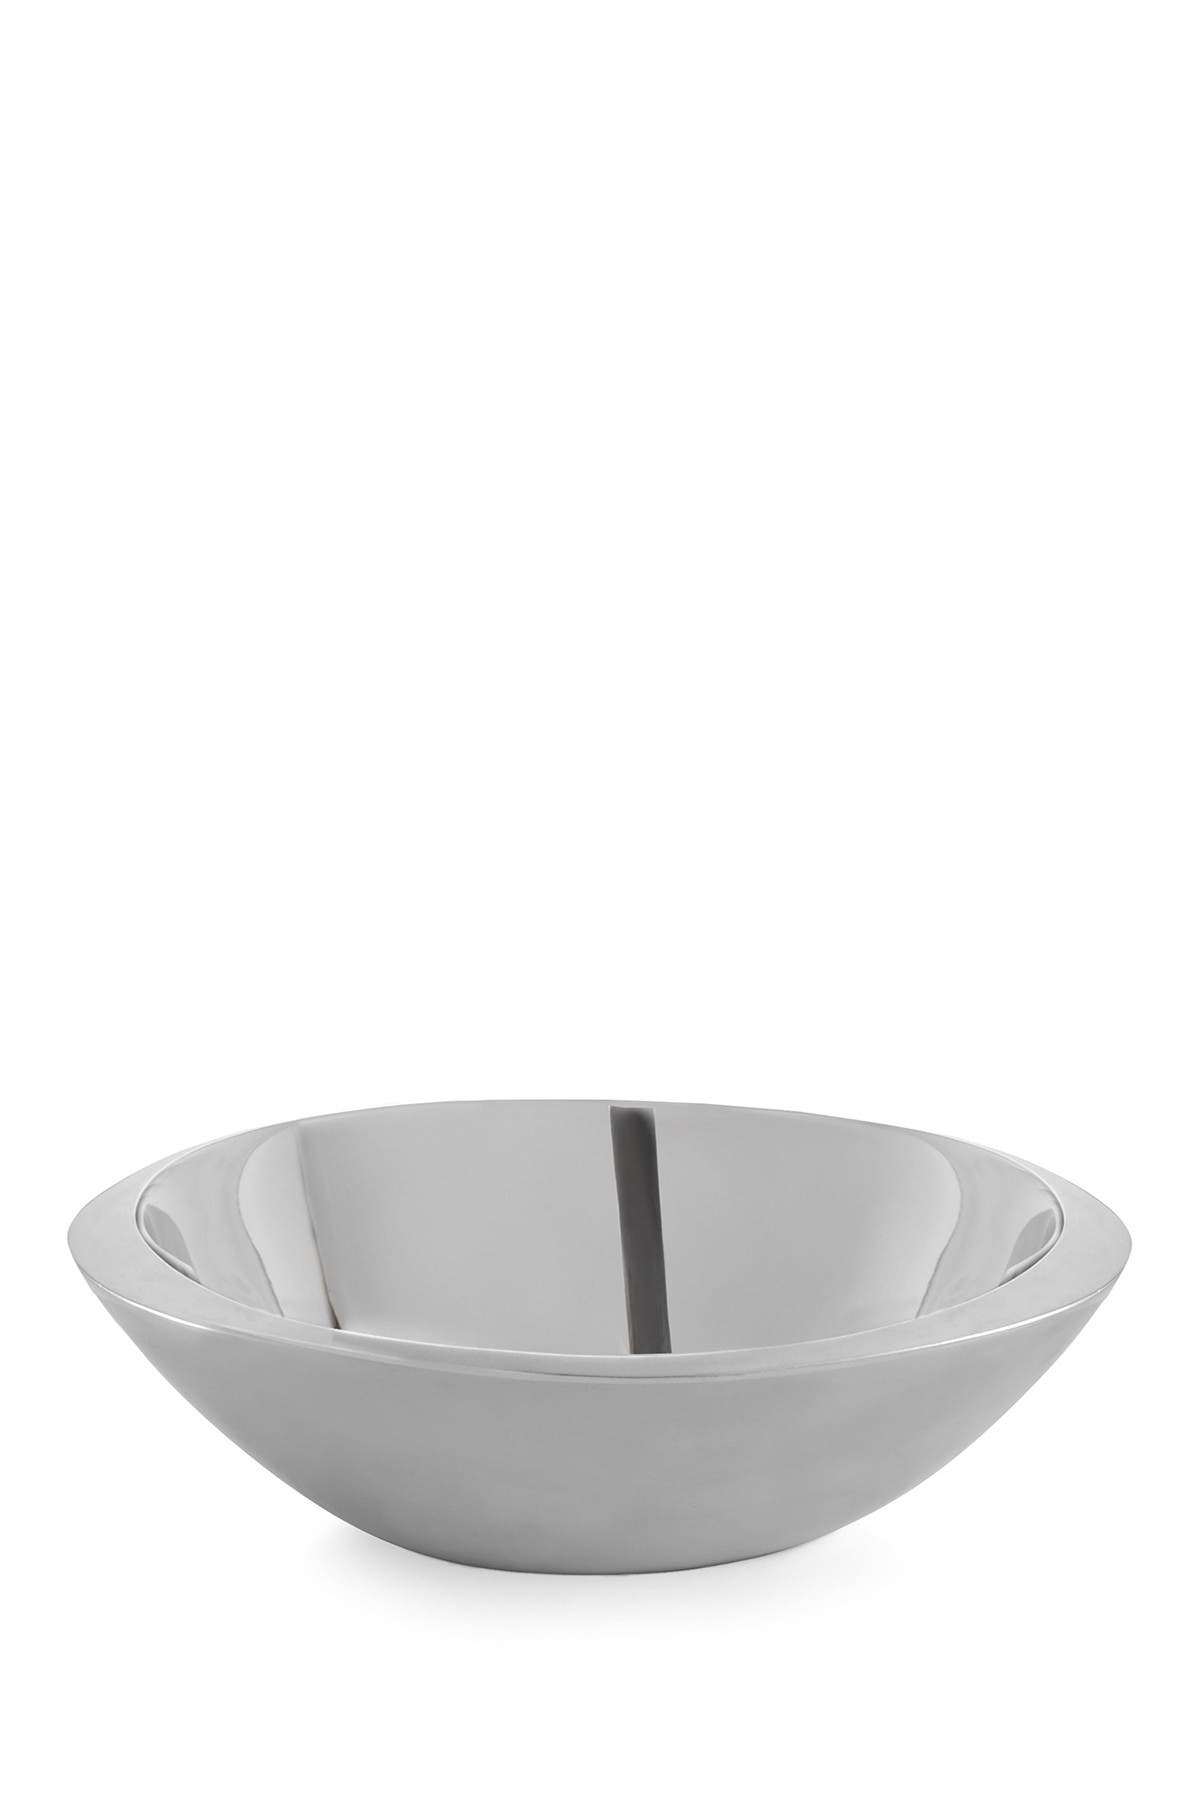 "Image of Nambe 12"" Eclipse Serving Bowl"